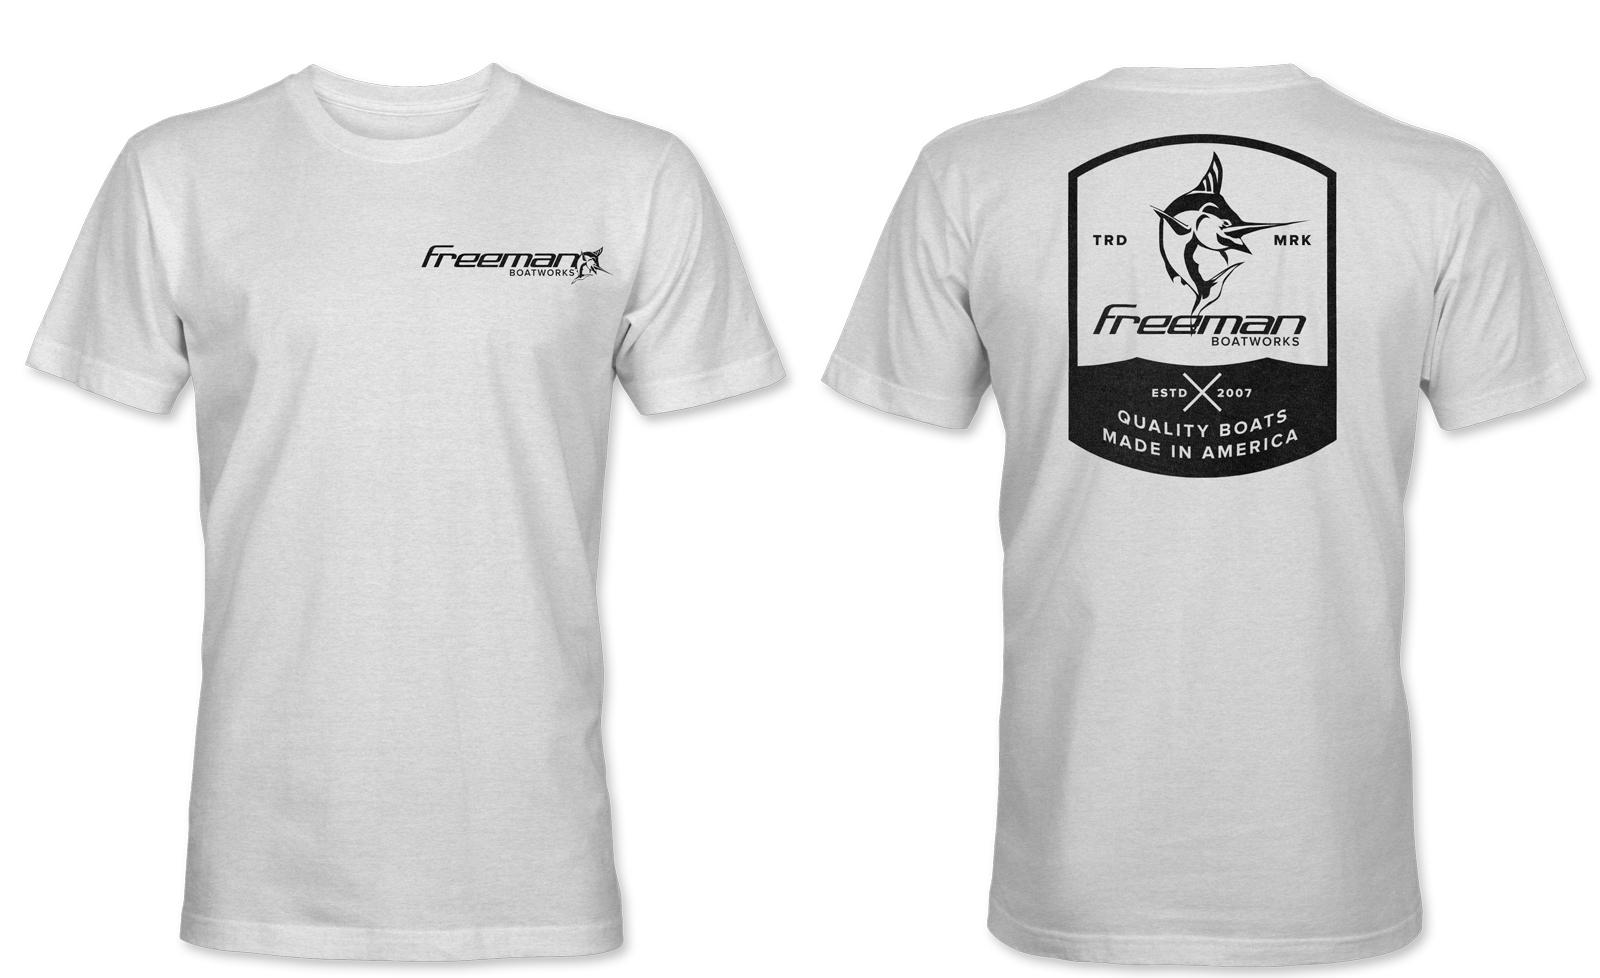 freemanboatworks_shirt02.jpg